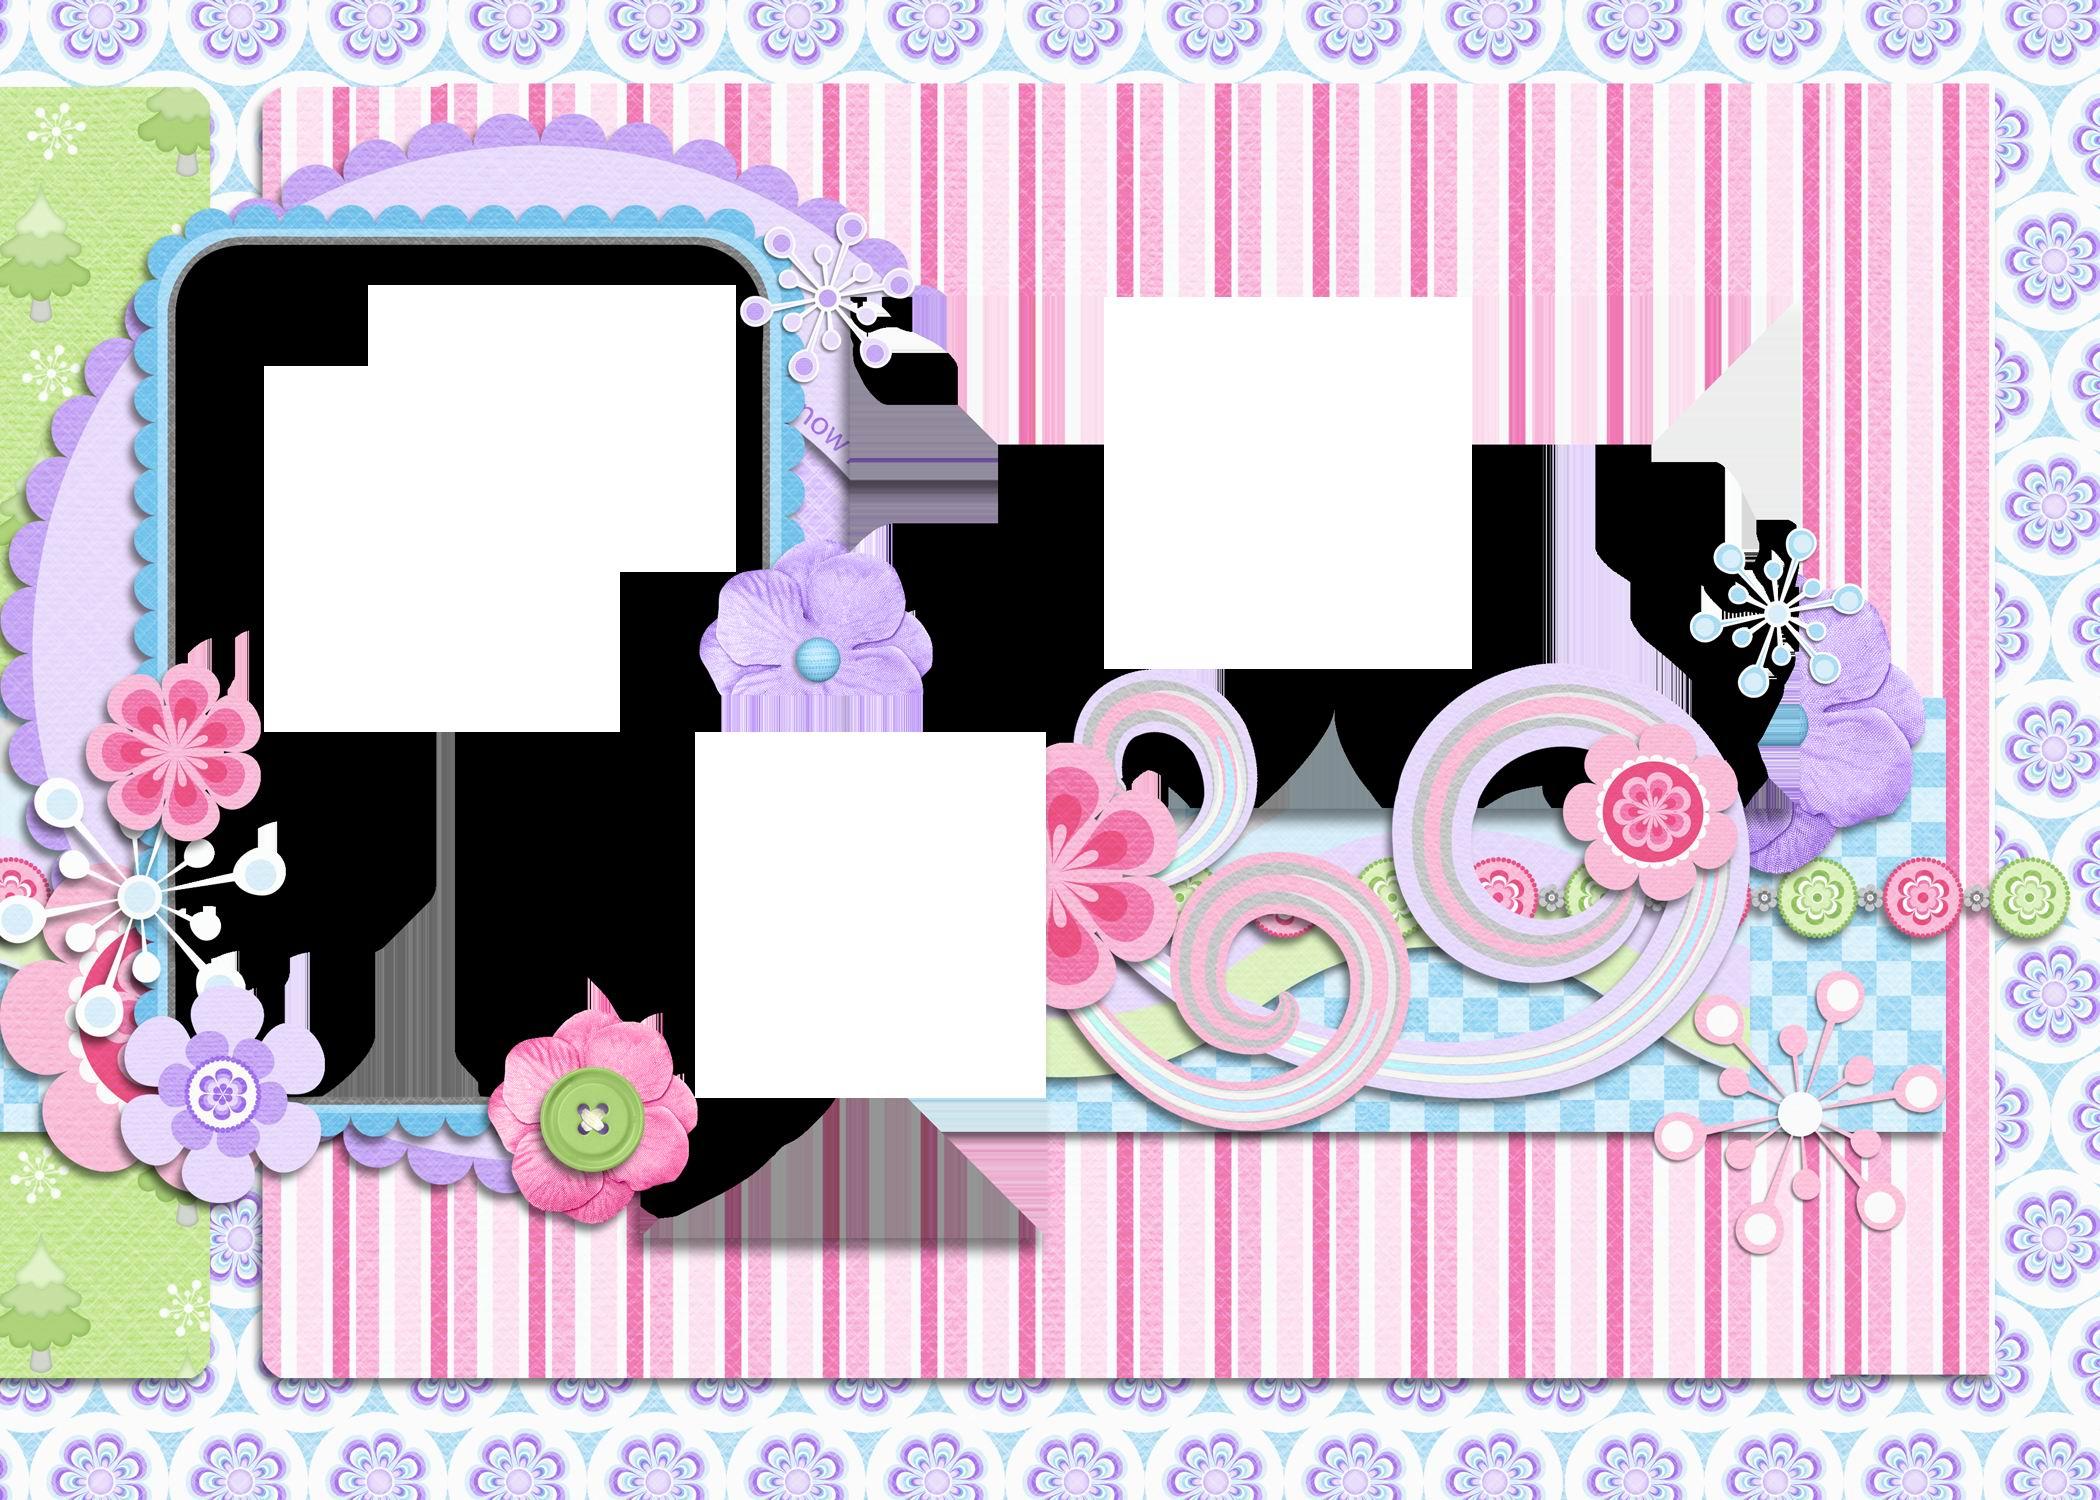 ps宝宝照片边框素材图片_ps宝宝照片边框素材图片下载